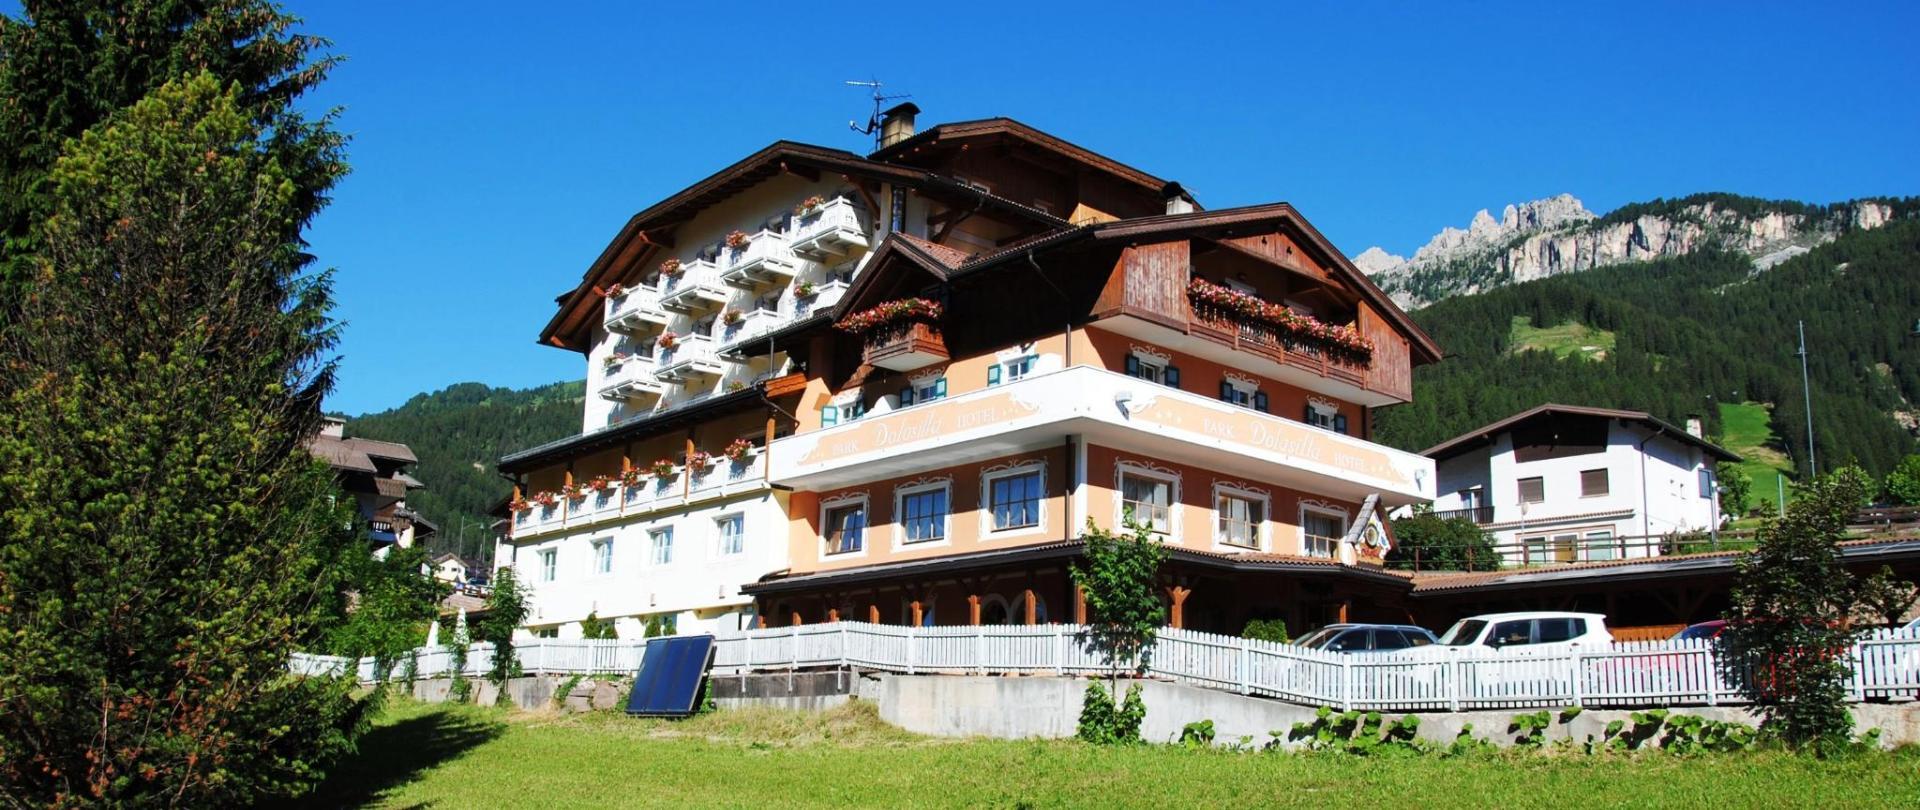 hotel estate 18 019.JPG